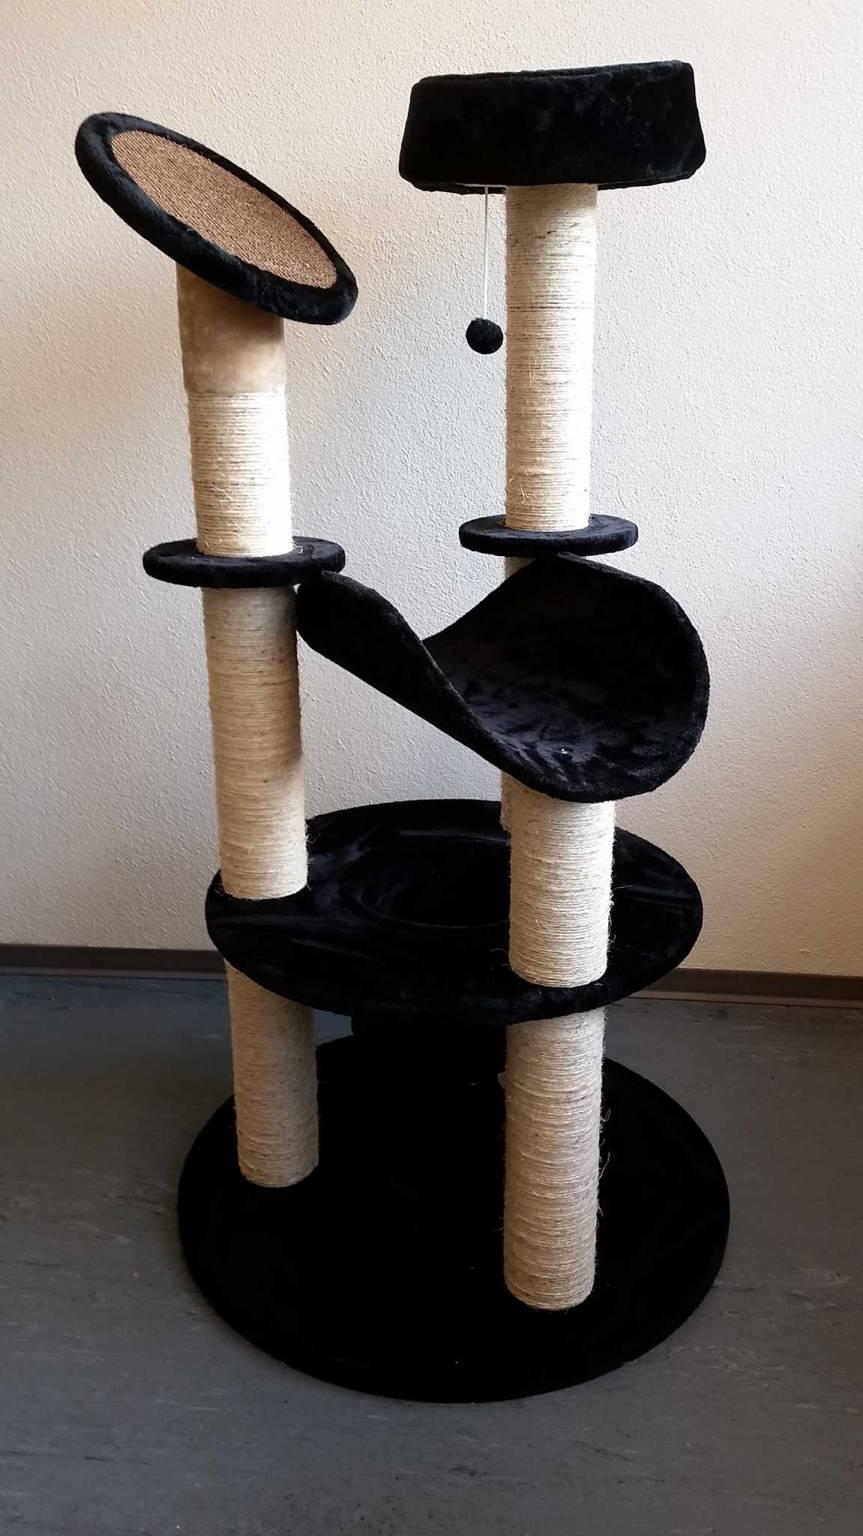 katzenbaum f r grosse katzen artikel q6 bk kratzb ume m bel. Black Bedroom Furniture Sets. Home Design Ideas